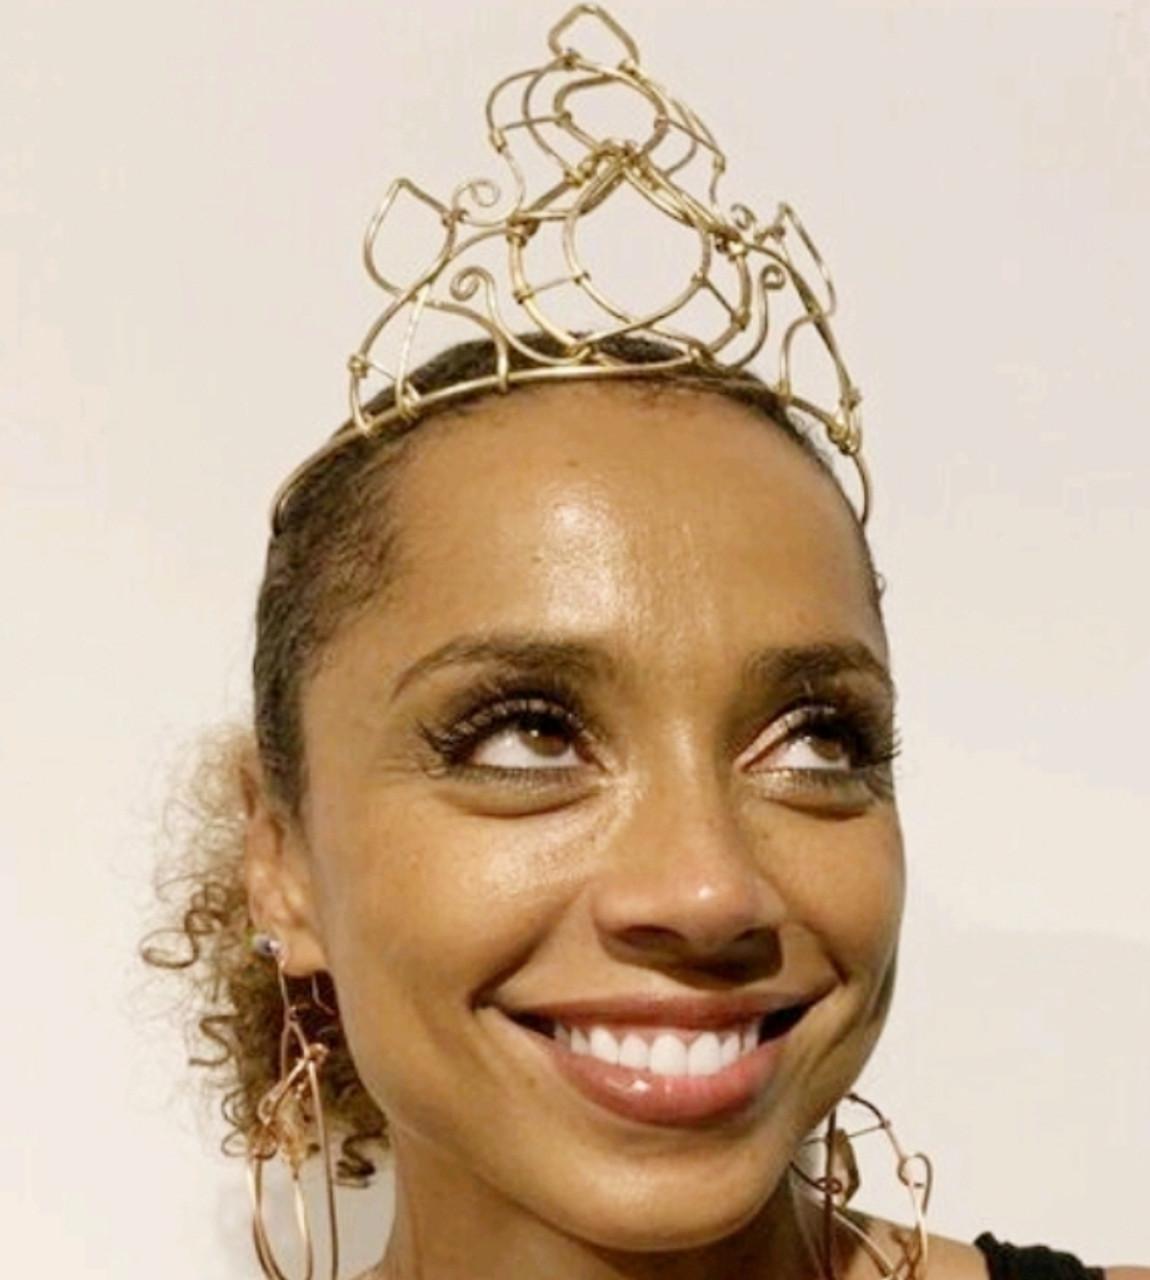 The Supreme Crown